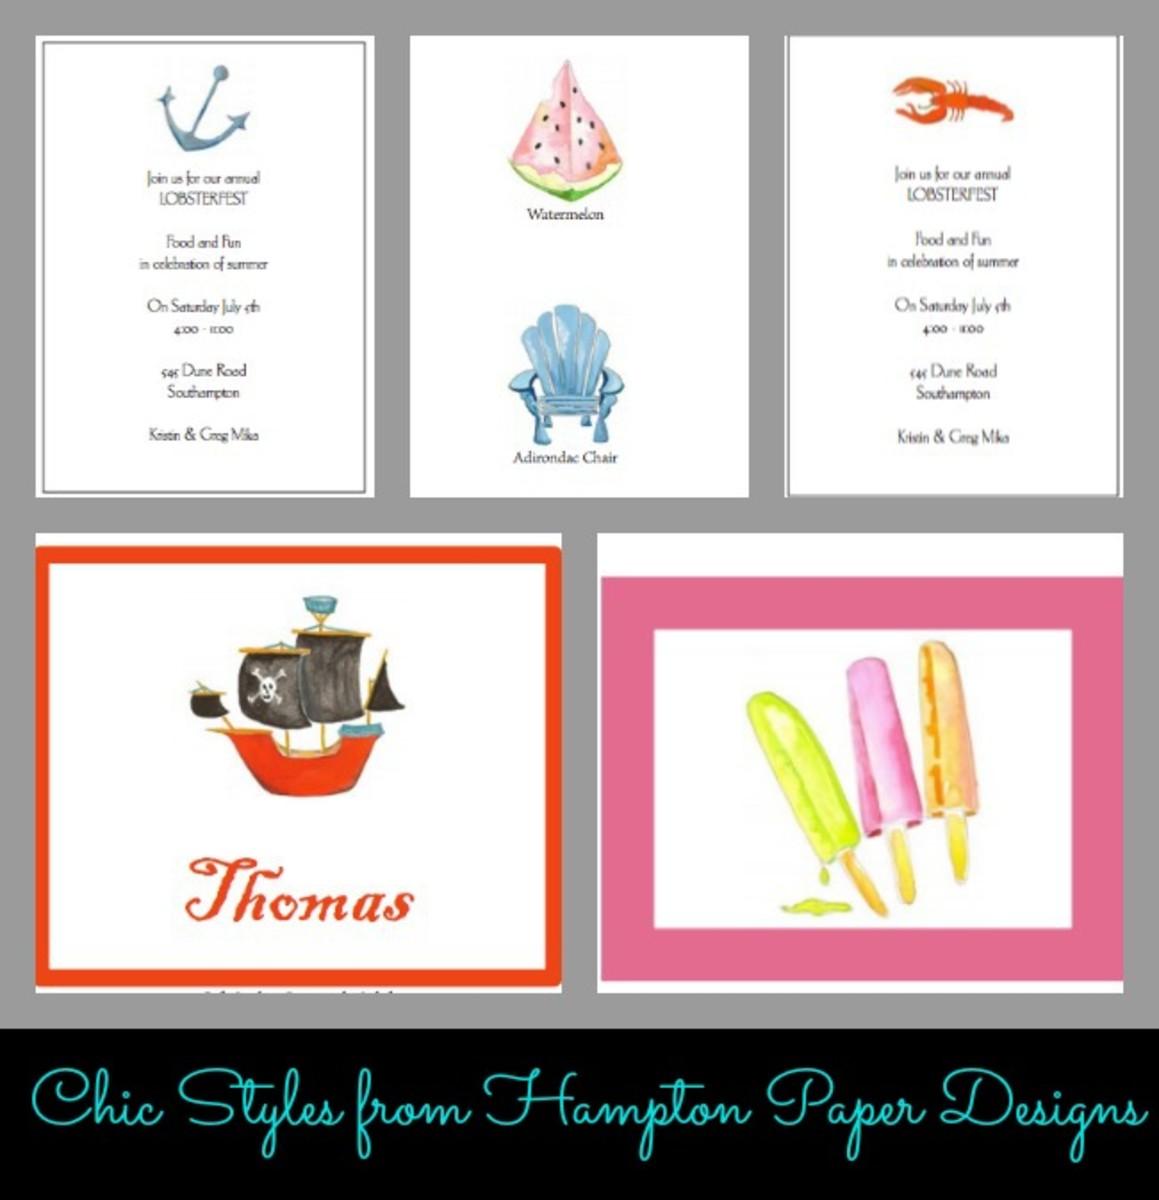 Hampton Paper Designs